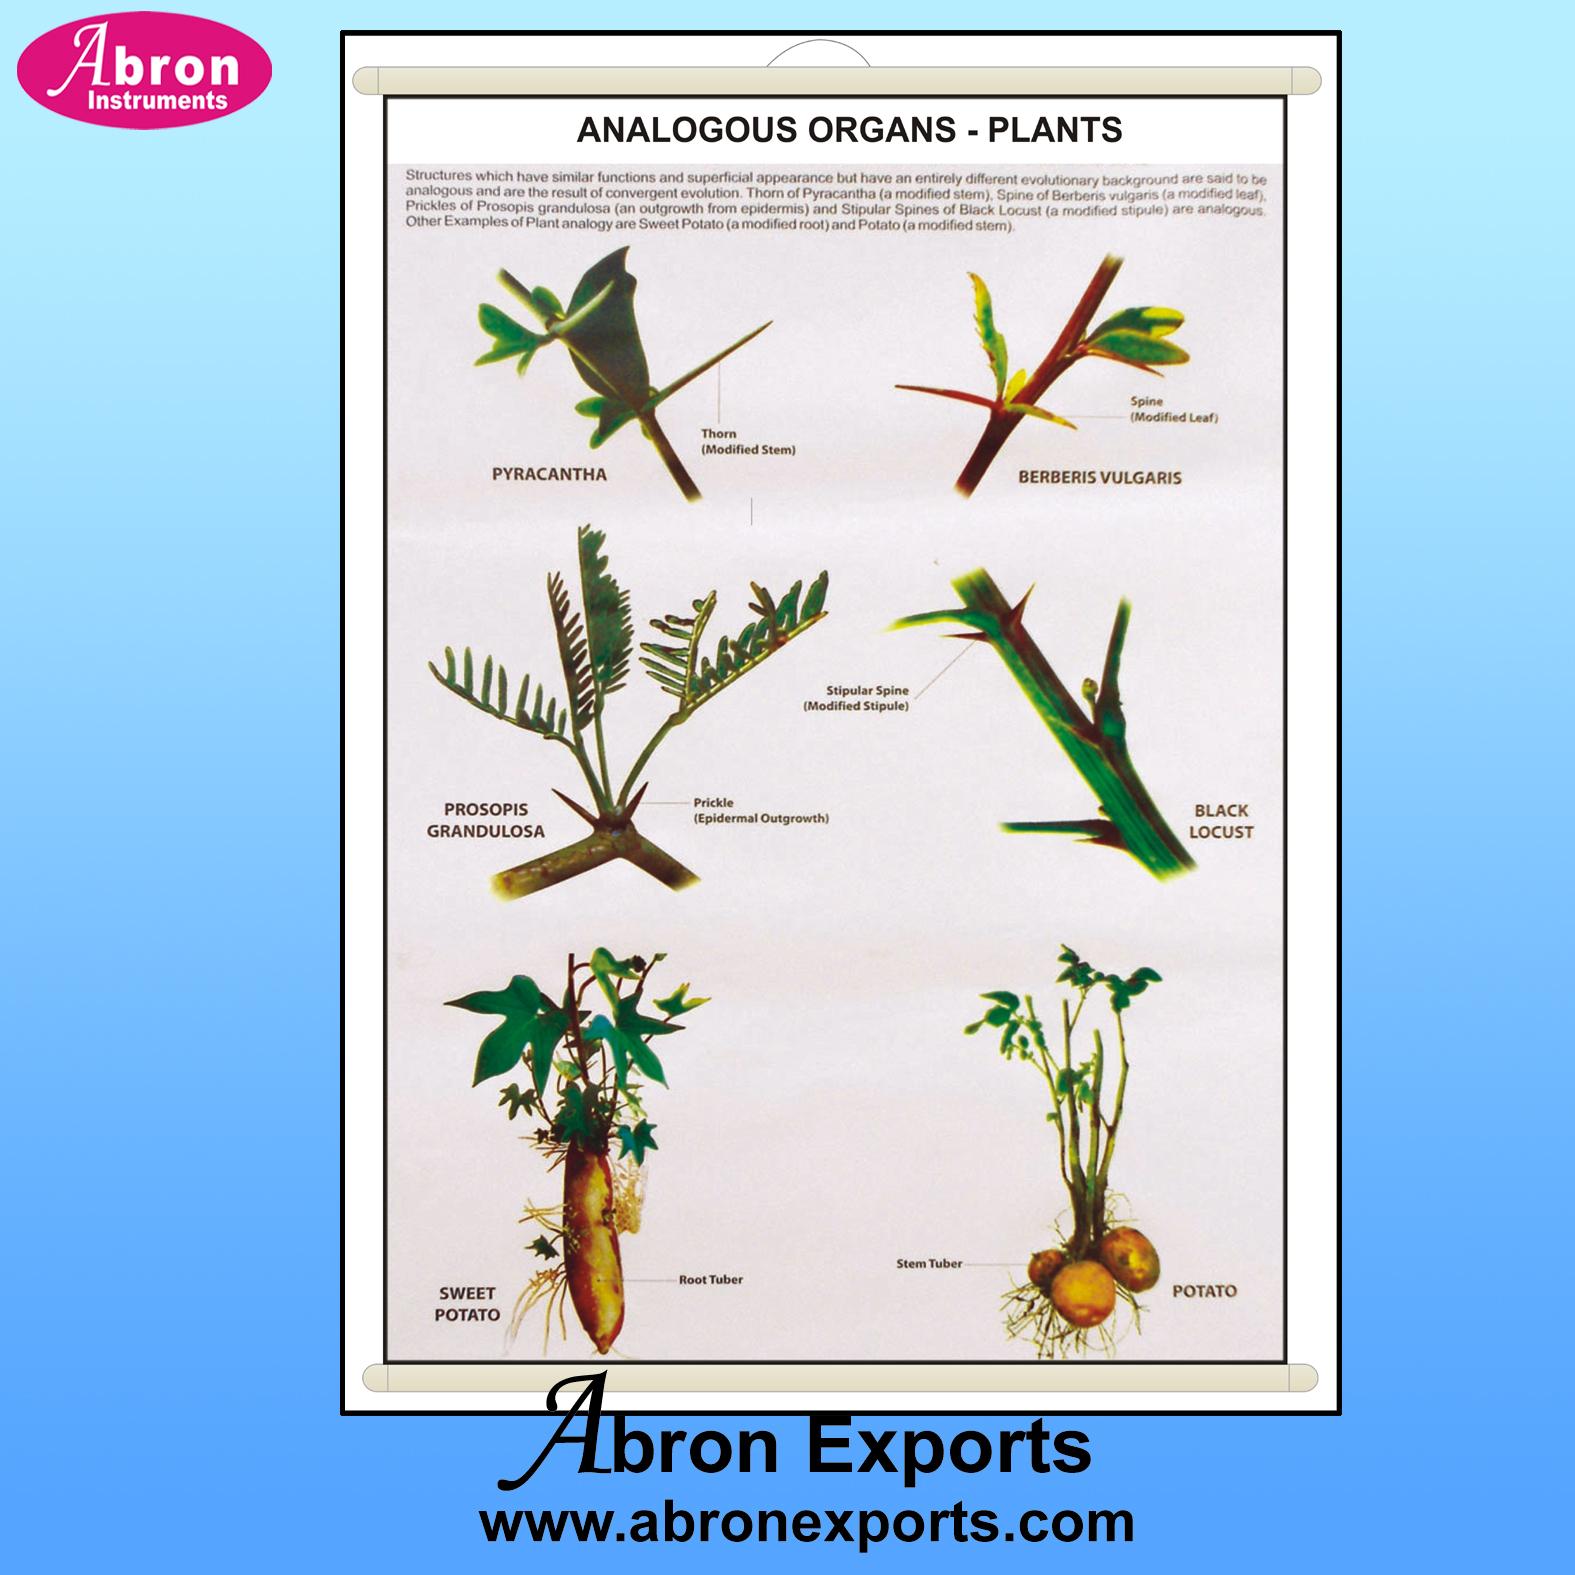 Chart gertics & evolution pedigree analogous organs plants abron